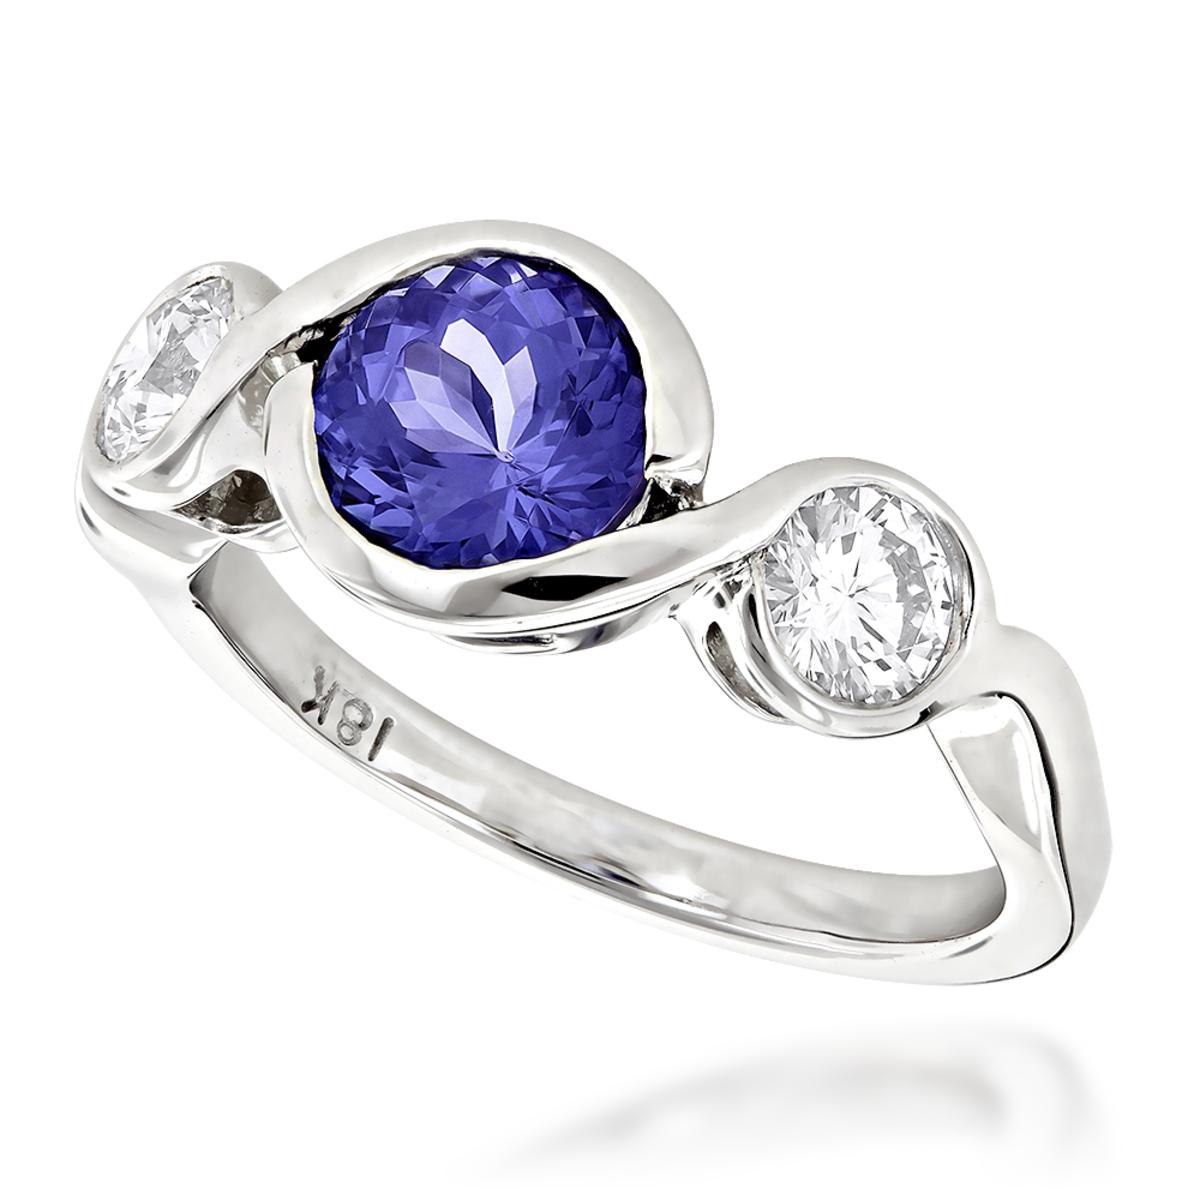 Unique Round Cut Tanzanite and Diamond Engagement Ring 18K White Gold